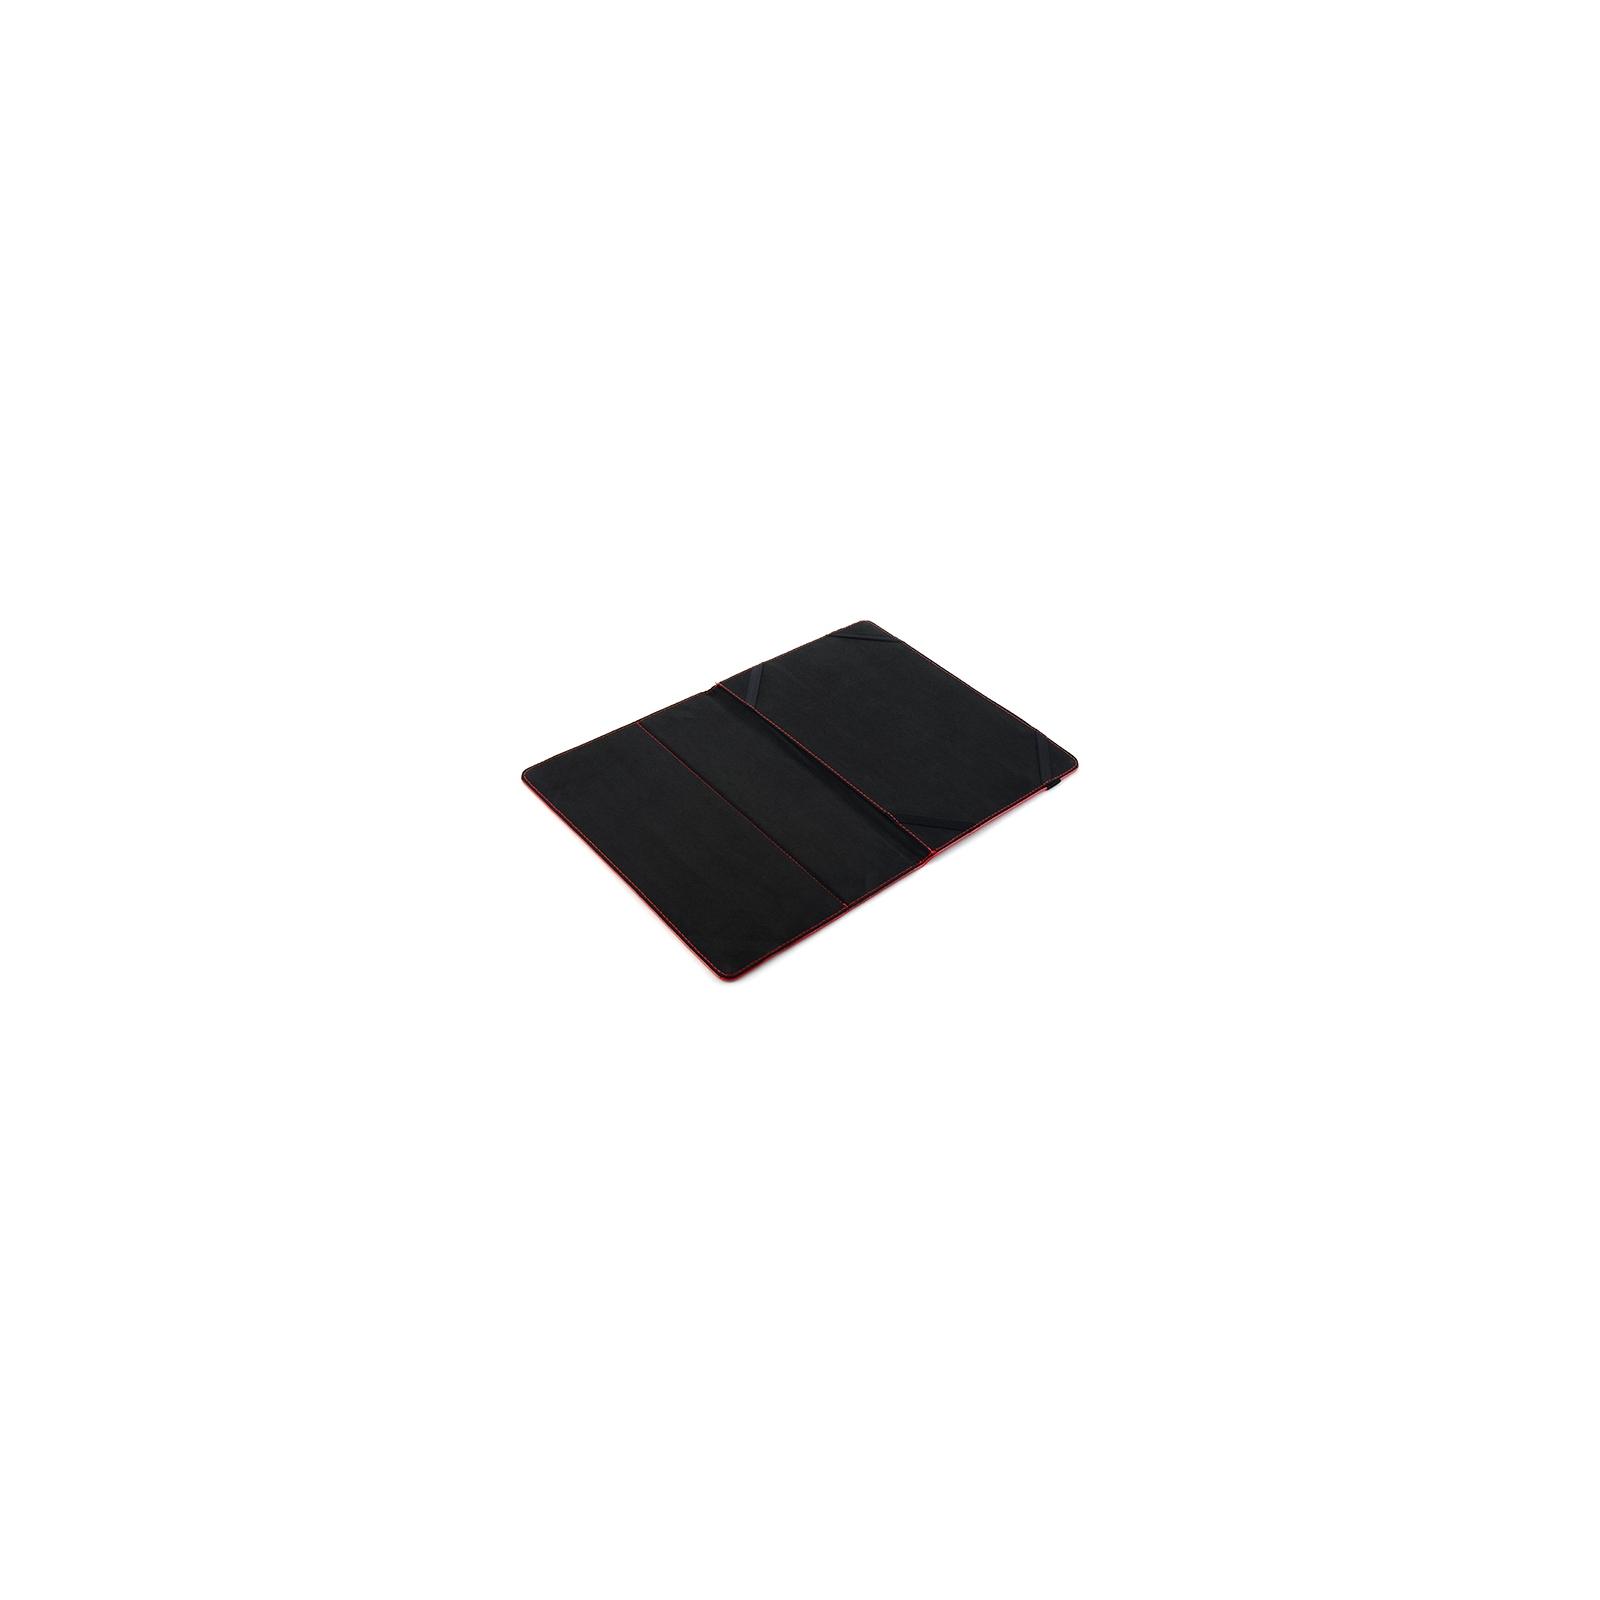 "Чехол для планшета 7"" Cover Stand Red Drobak (215303) изображение 3"